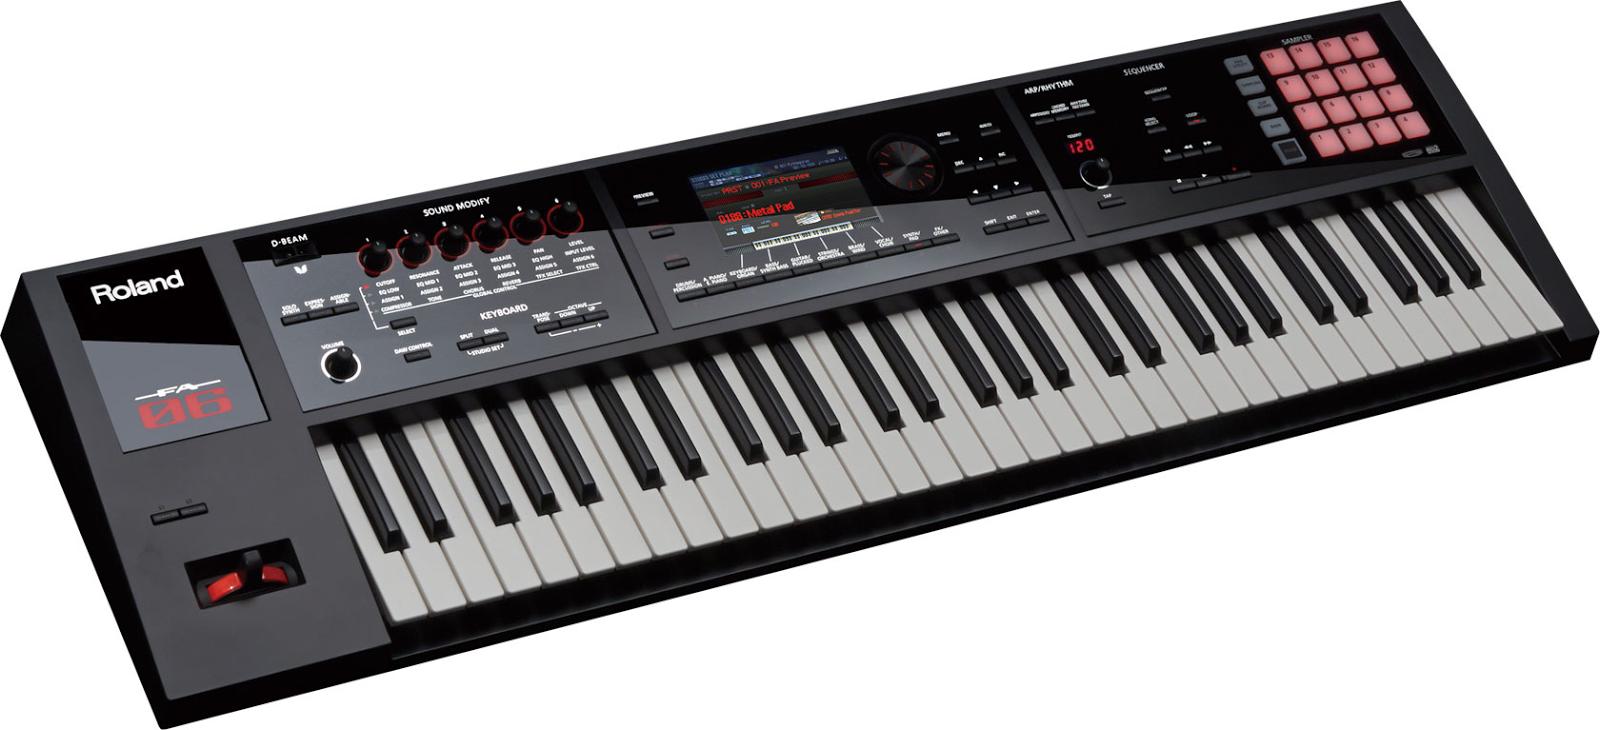 Review Keyboard Roland Lengkap